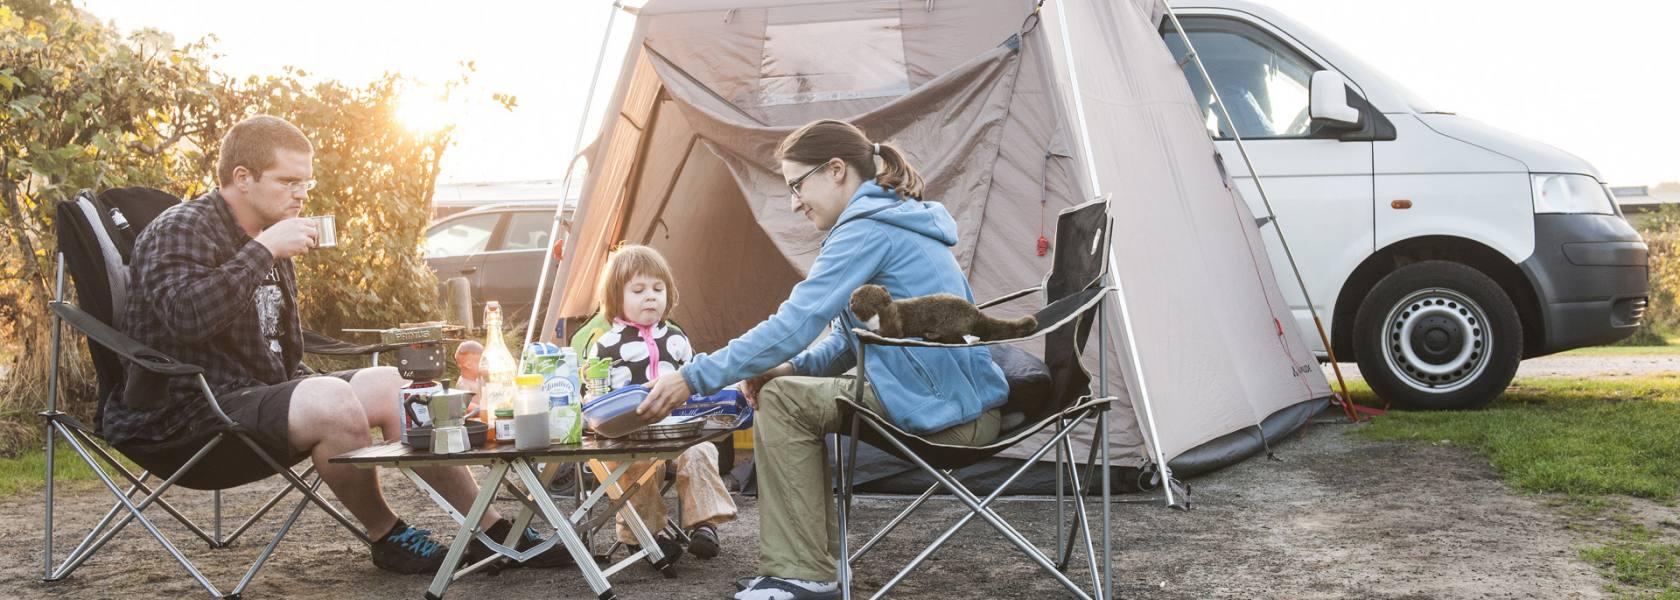 Familiencamping im Wangerland, © Florian Trykowski